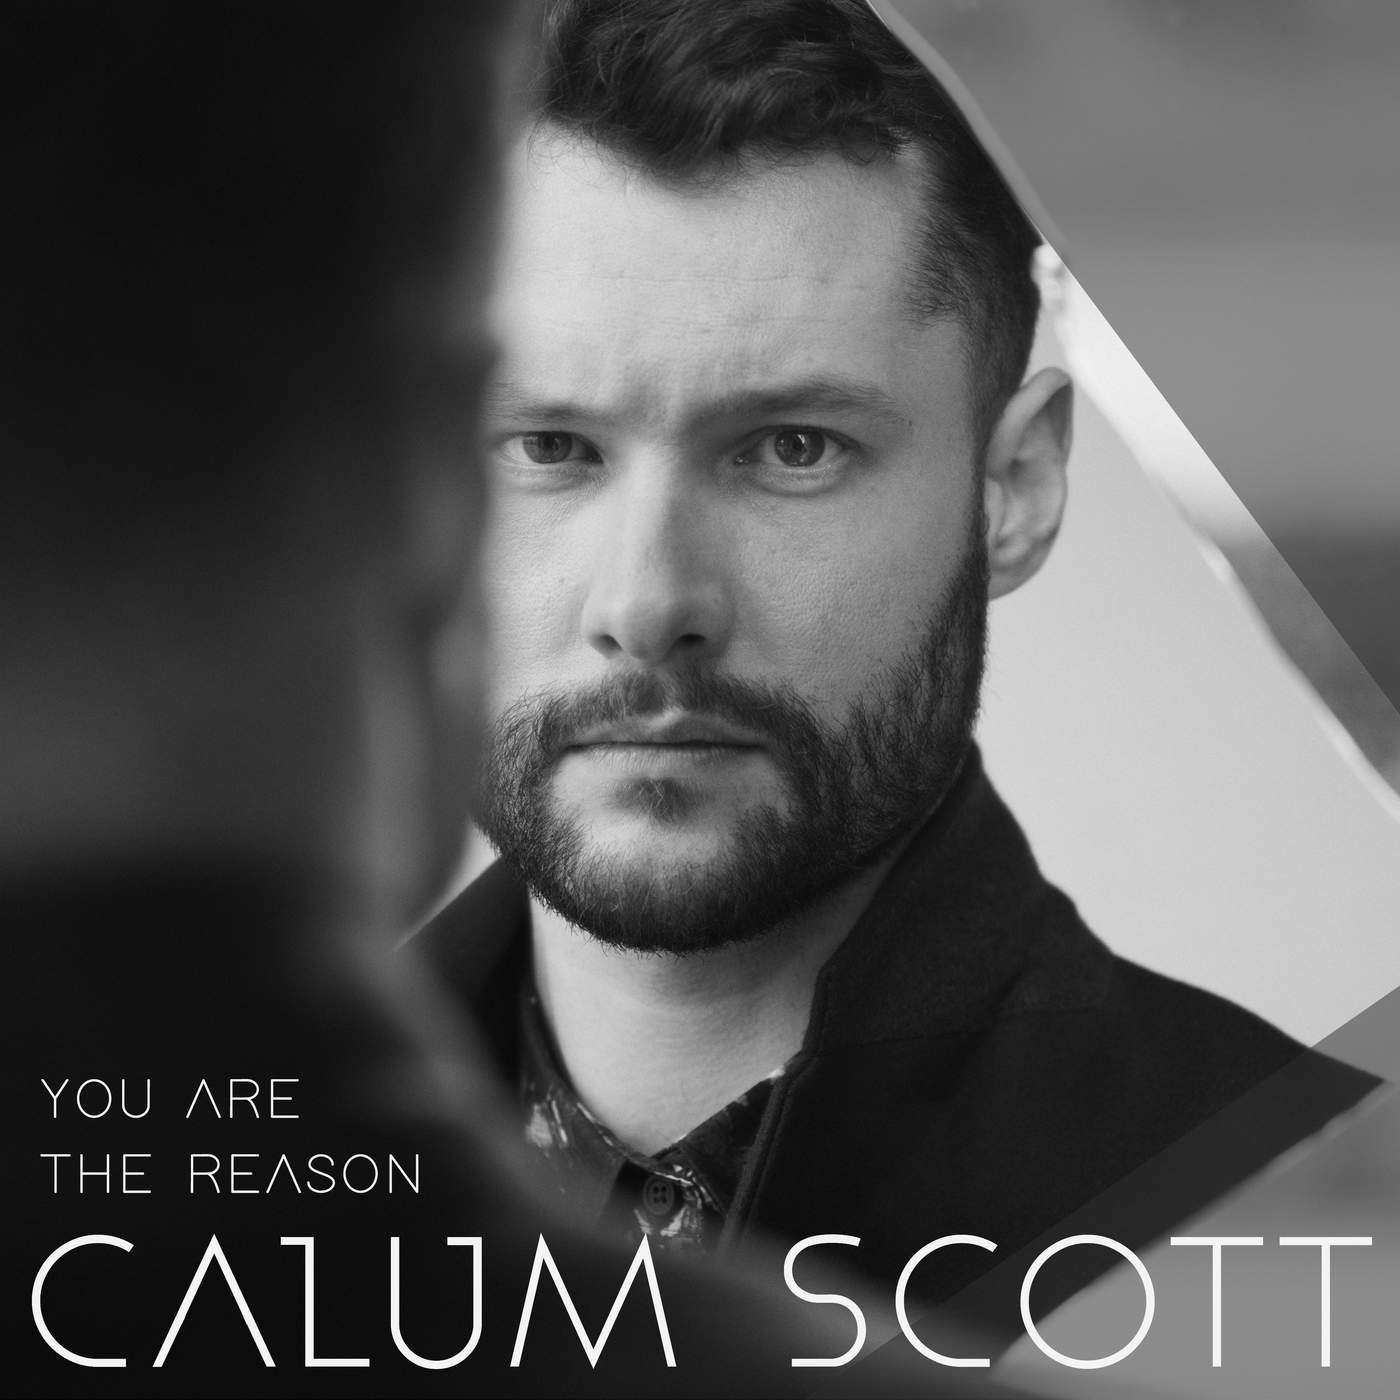 Calum Scott - You Are the Reason - Single